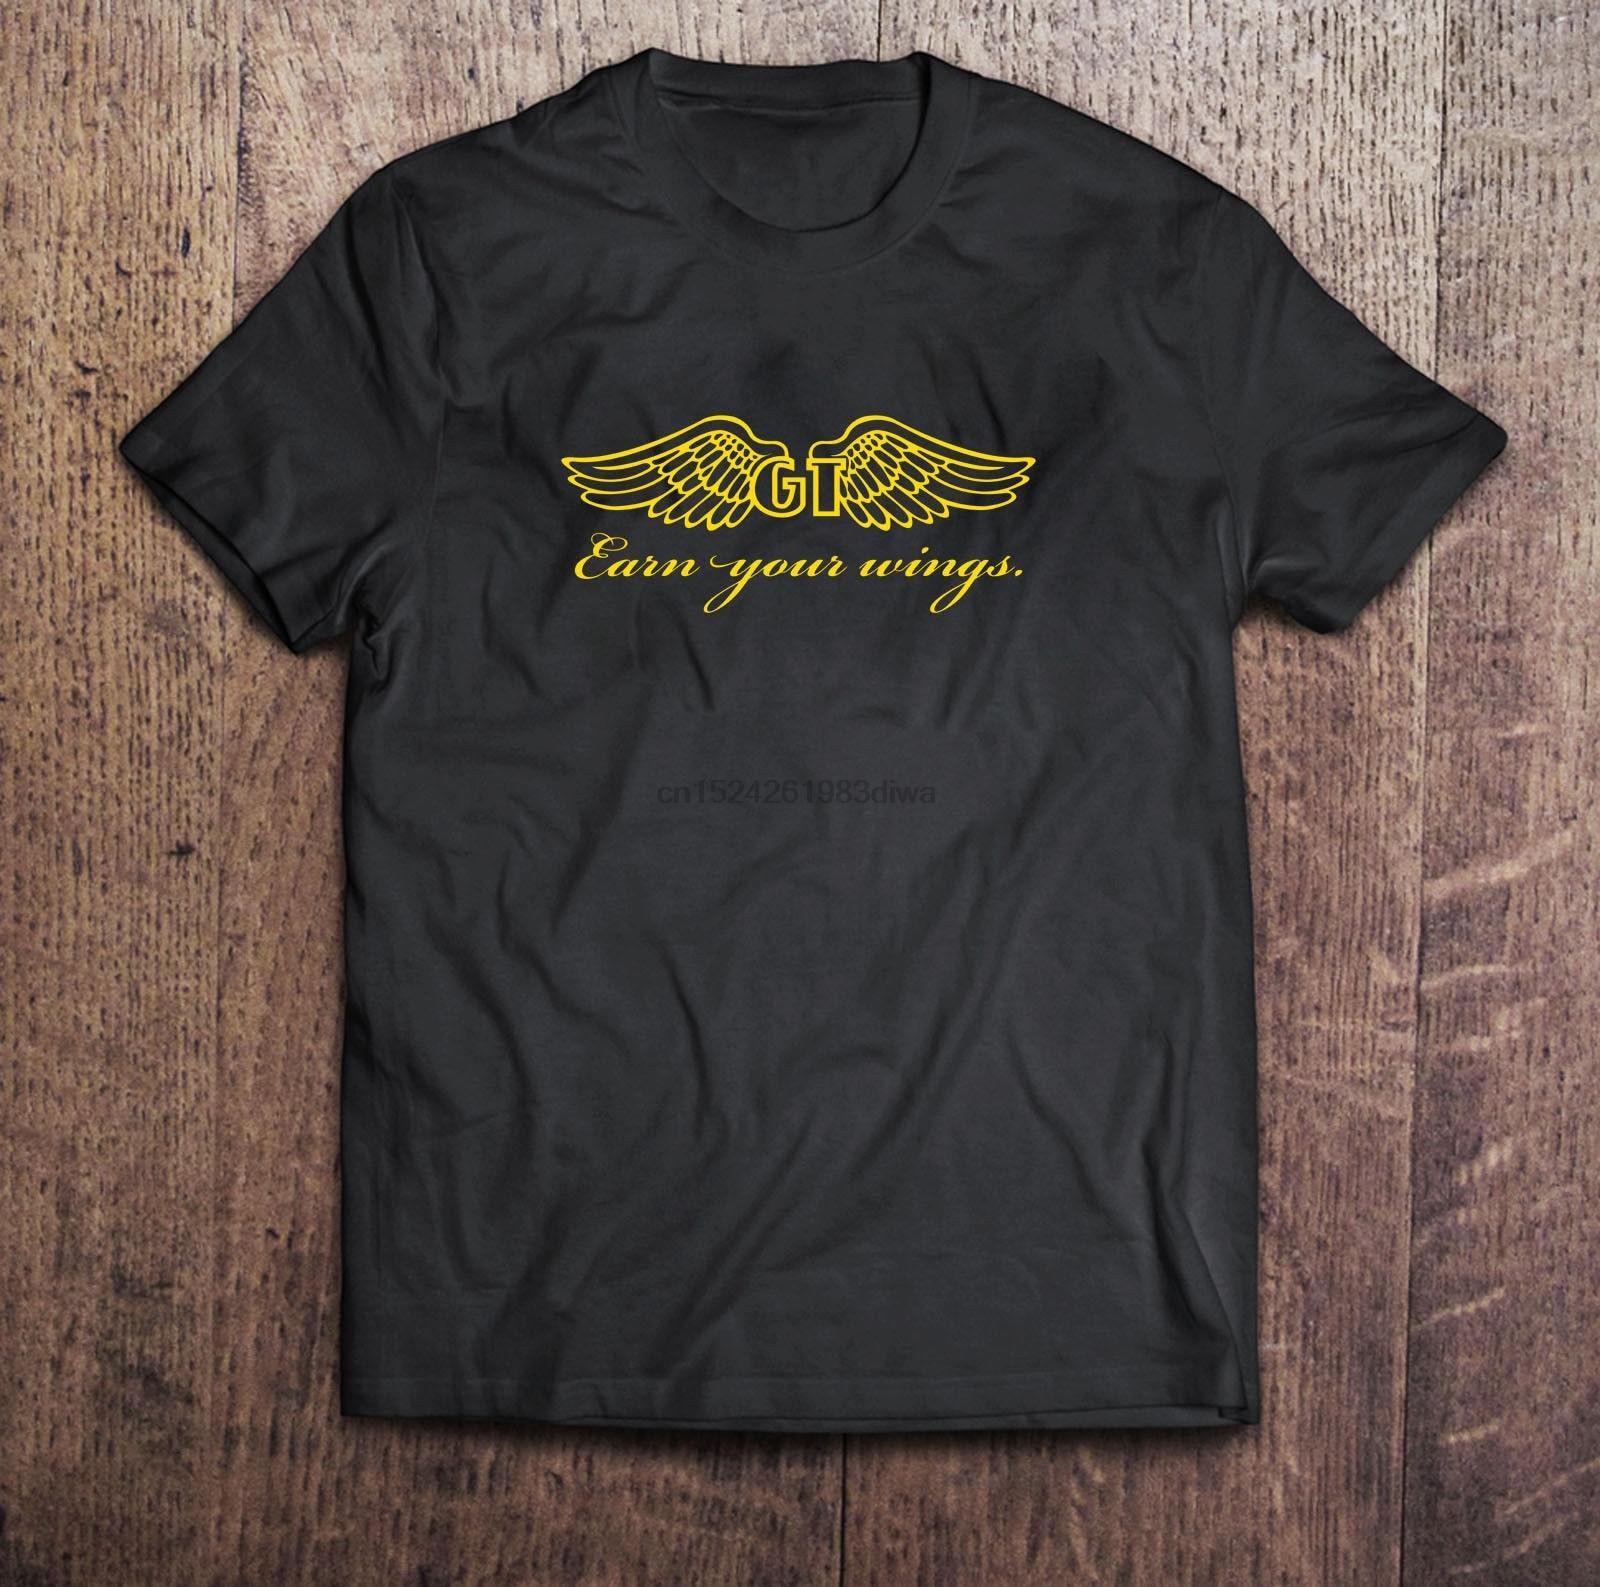 Camiseta negra GT Bicycle BMX para hombre personalizada S a 3XL